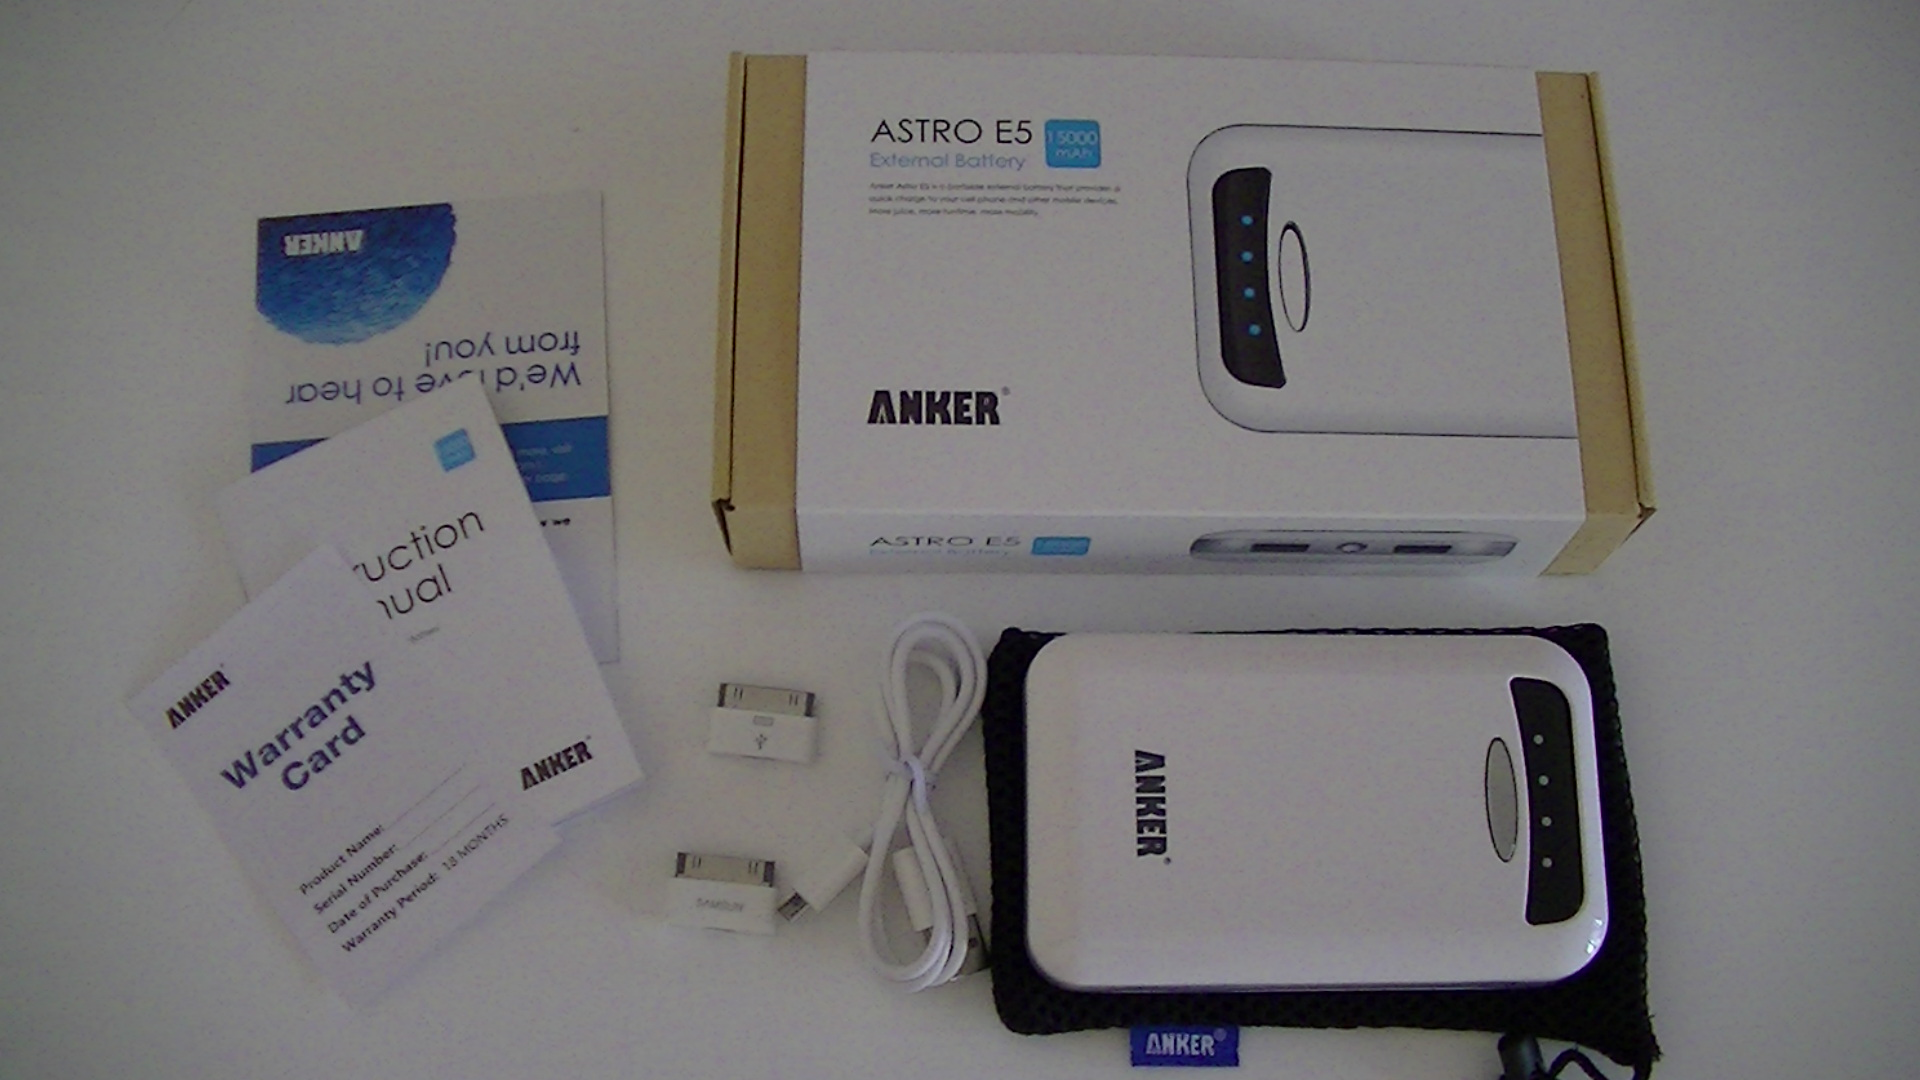 test de l anker astro e5 une m ga grosse batterie externe top for phone. Black Bedroom Furniture Sets. Home Design Ideas